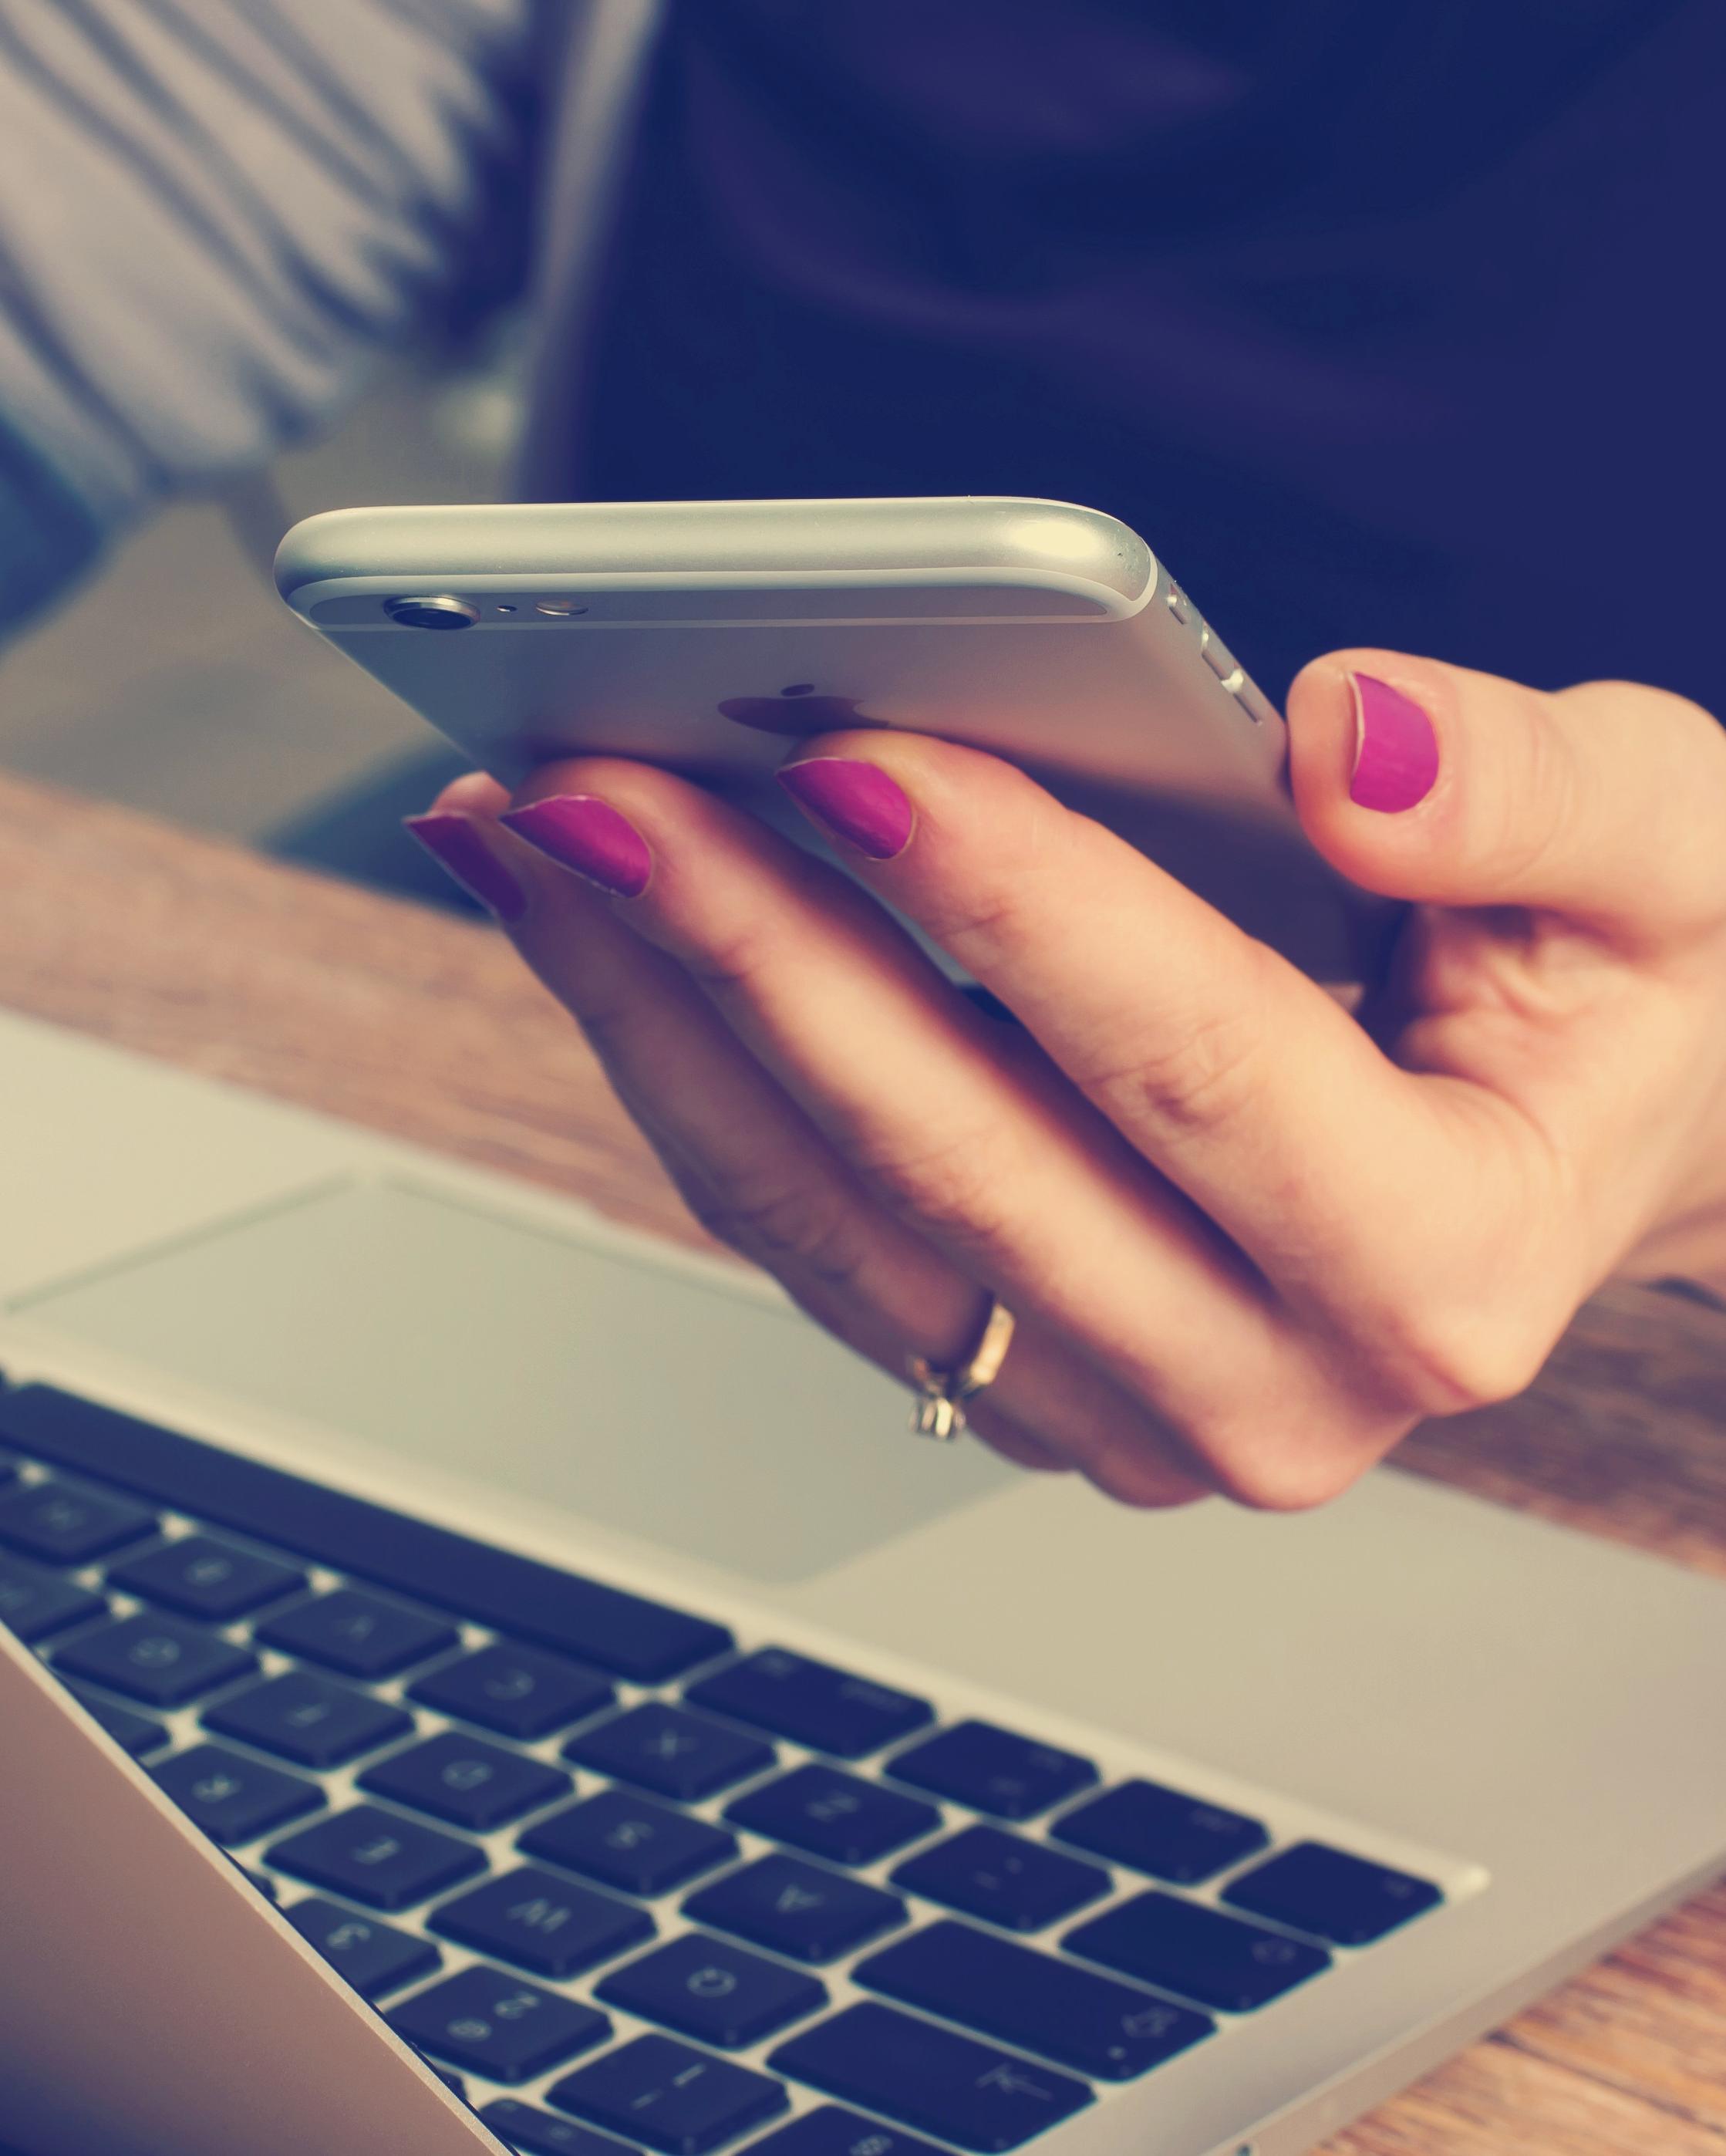 woman-holding-smartphone-1015